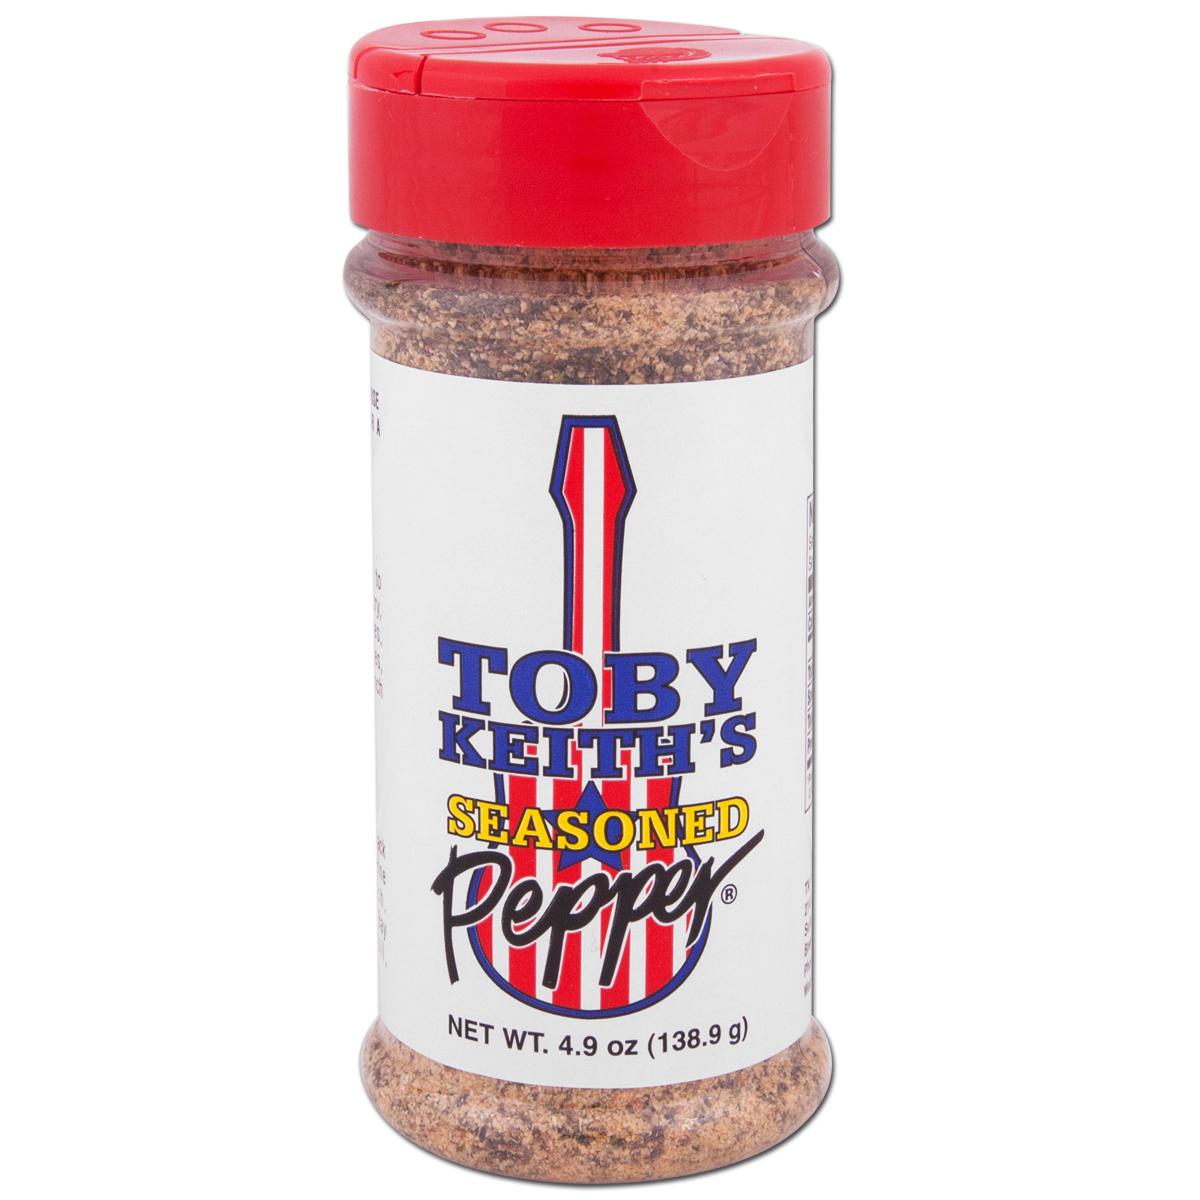 Toby Keith - Seasoned Pepper 4.9oz